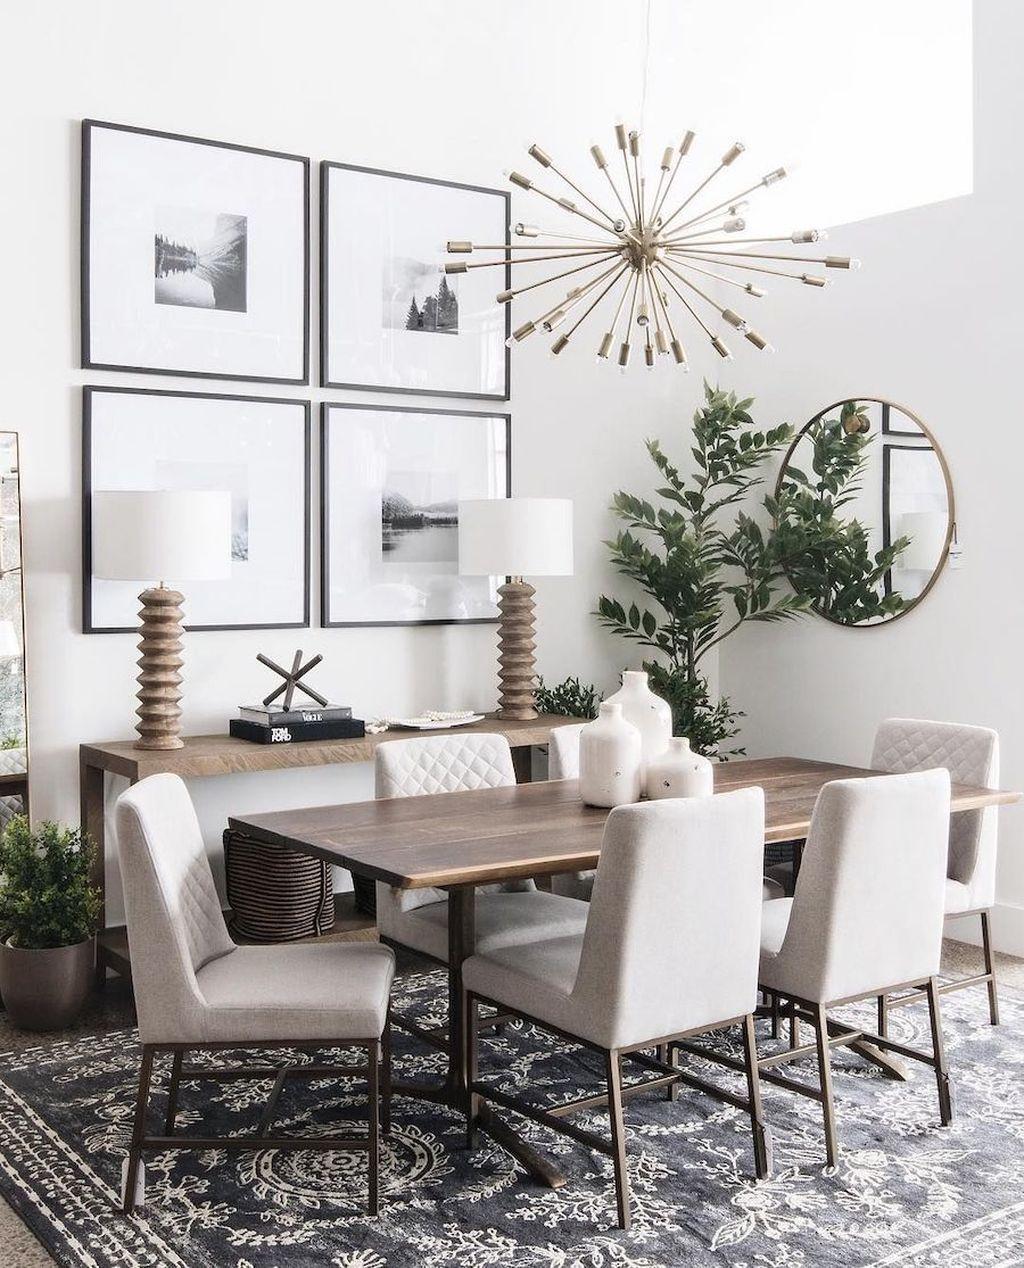 44 Popular Contemporary Dining Room Design Ideas Homyhomee In 2020 Small Dining Room Decor Modern Farmhouse Dining Room Dining Room Small